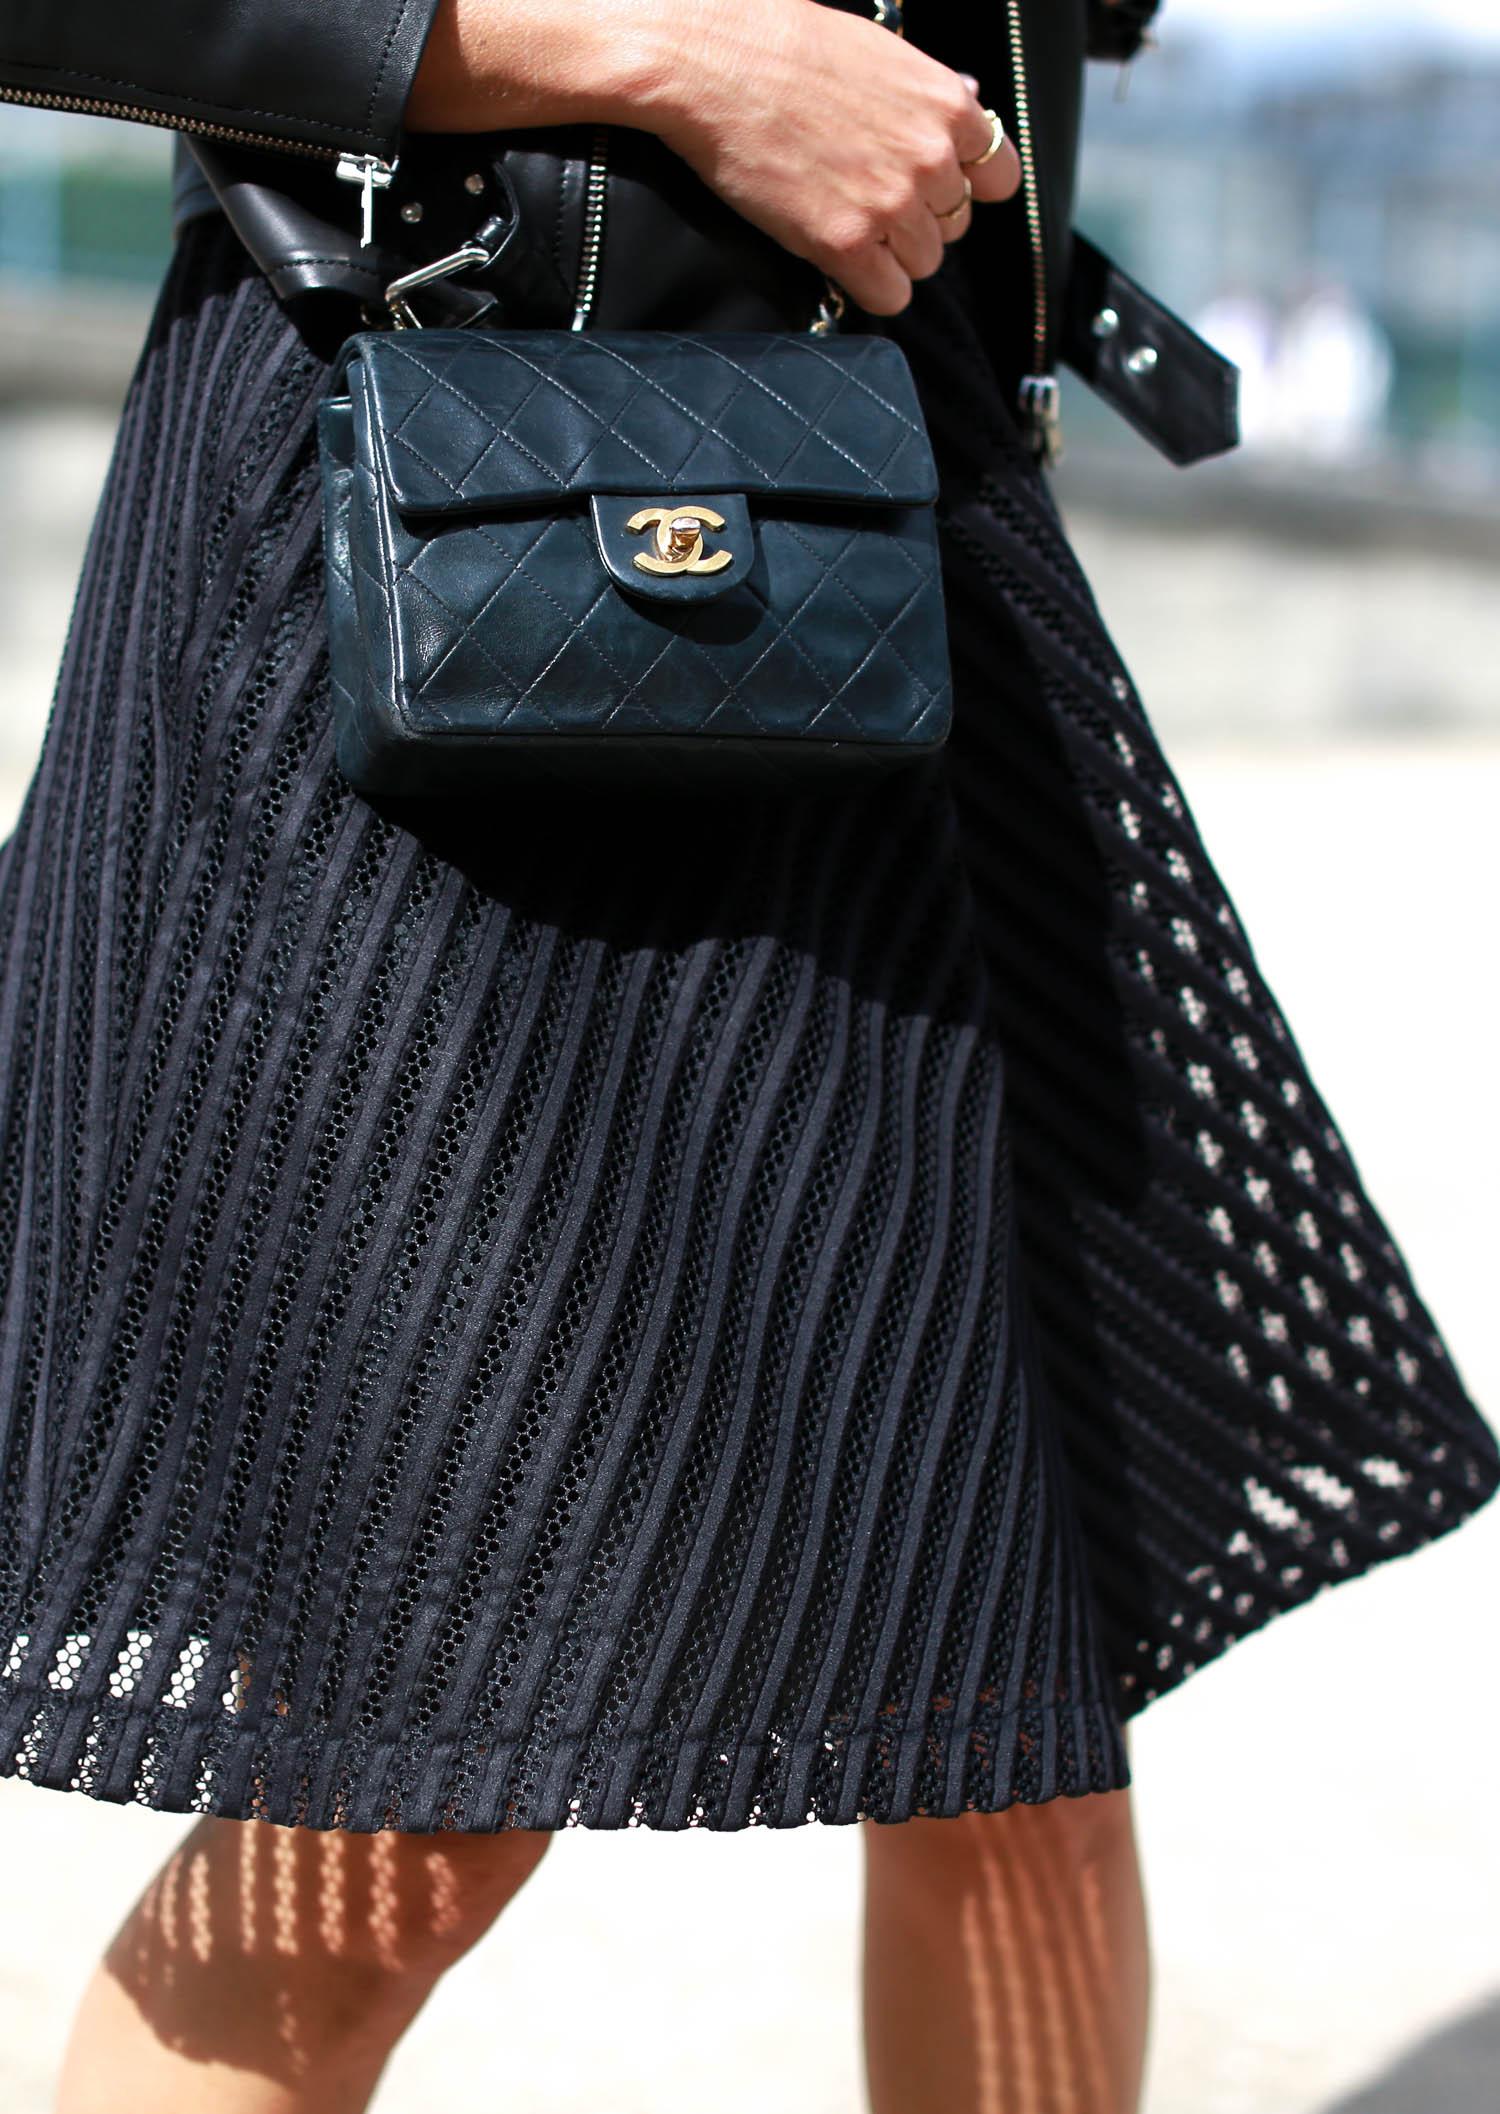 bartabac paris total black iro perfecto chloe boots chanel bag-16